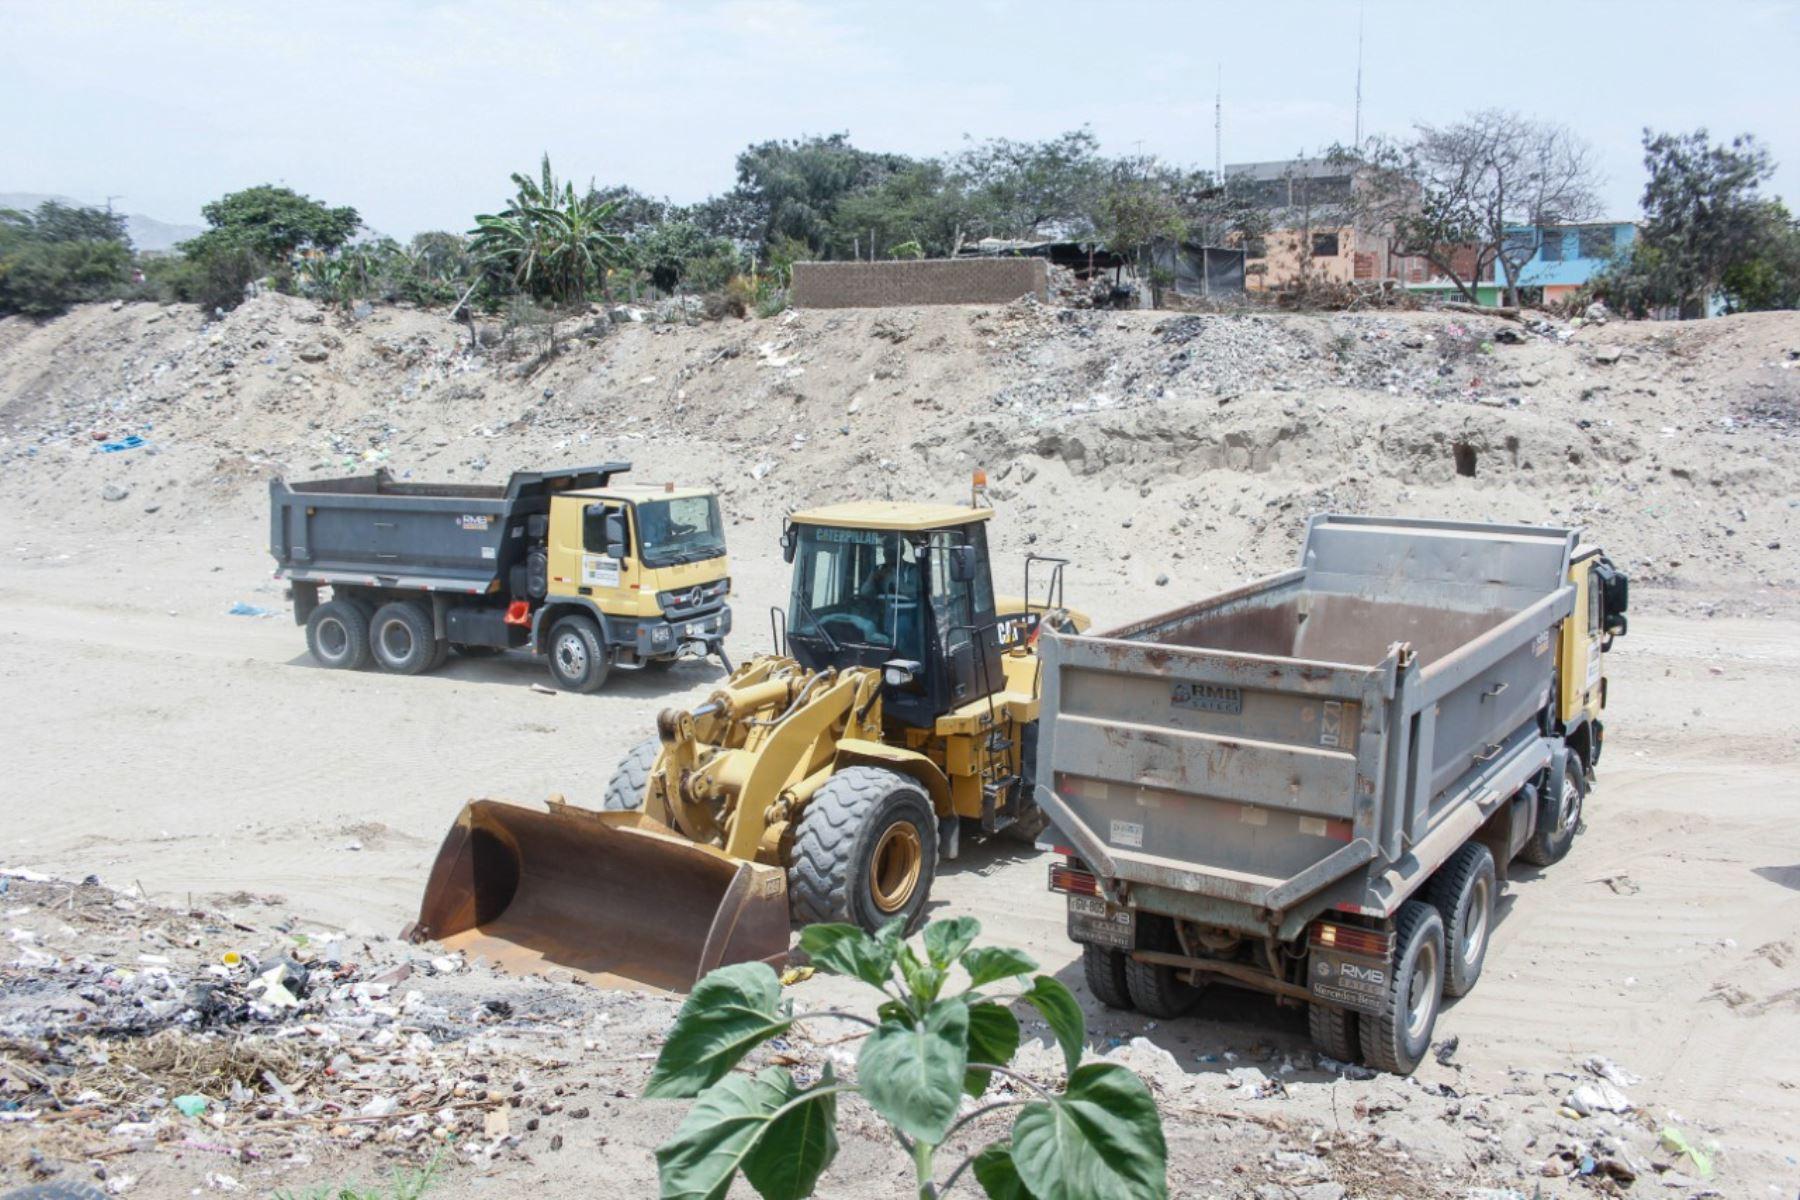 Trujillo: inician trabajos de descolmatación en la quebrada San Ildefonso - Agencia Andina